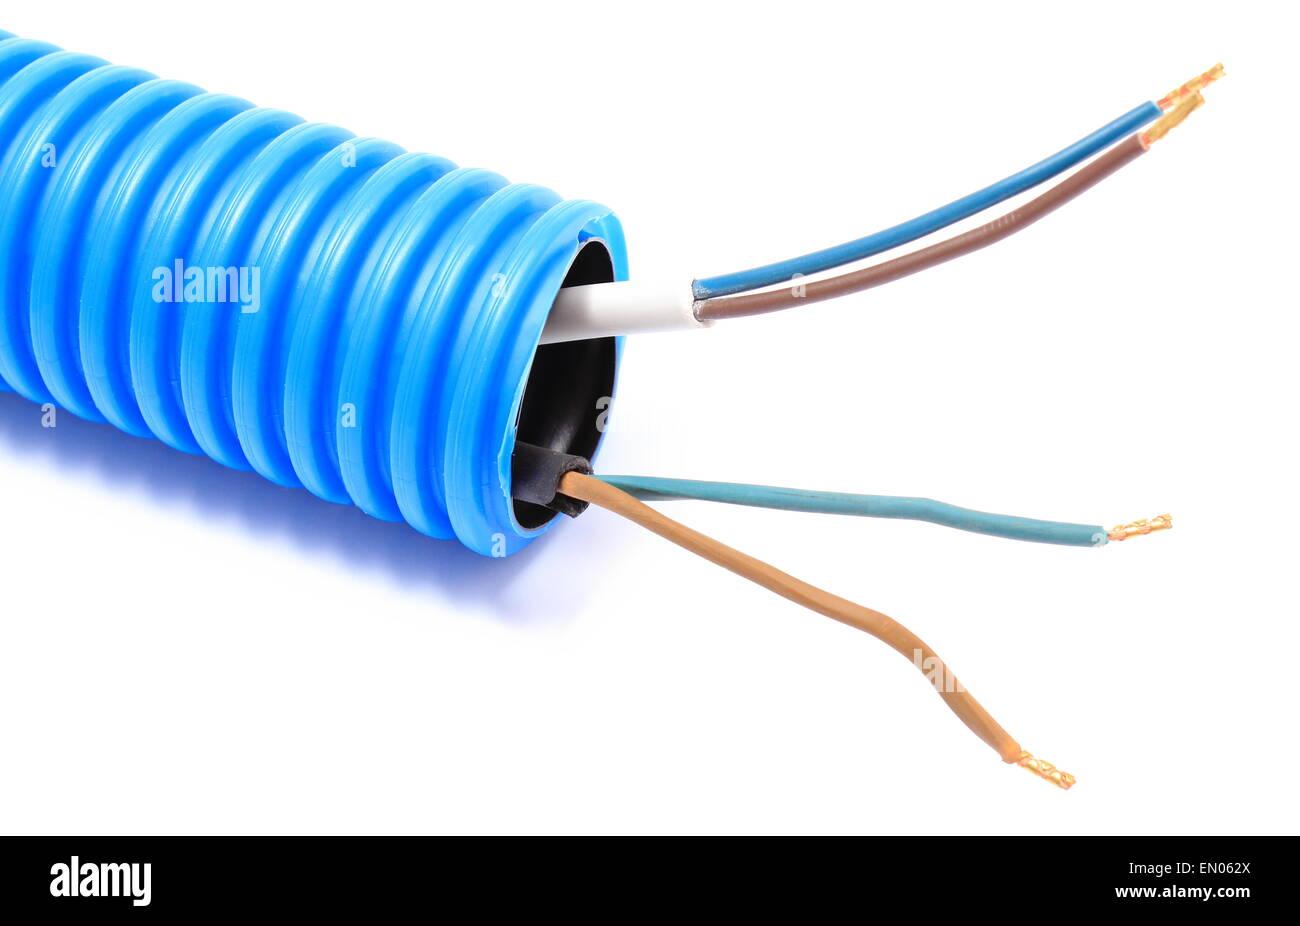 Wire Conduit Stockfotos & Wire Conduit Bilder - Alamy